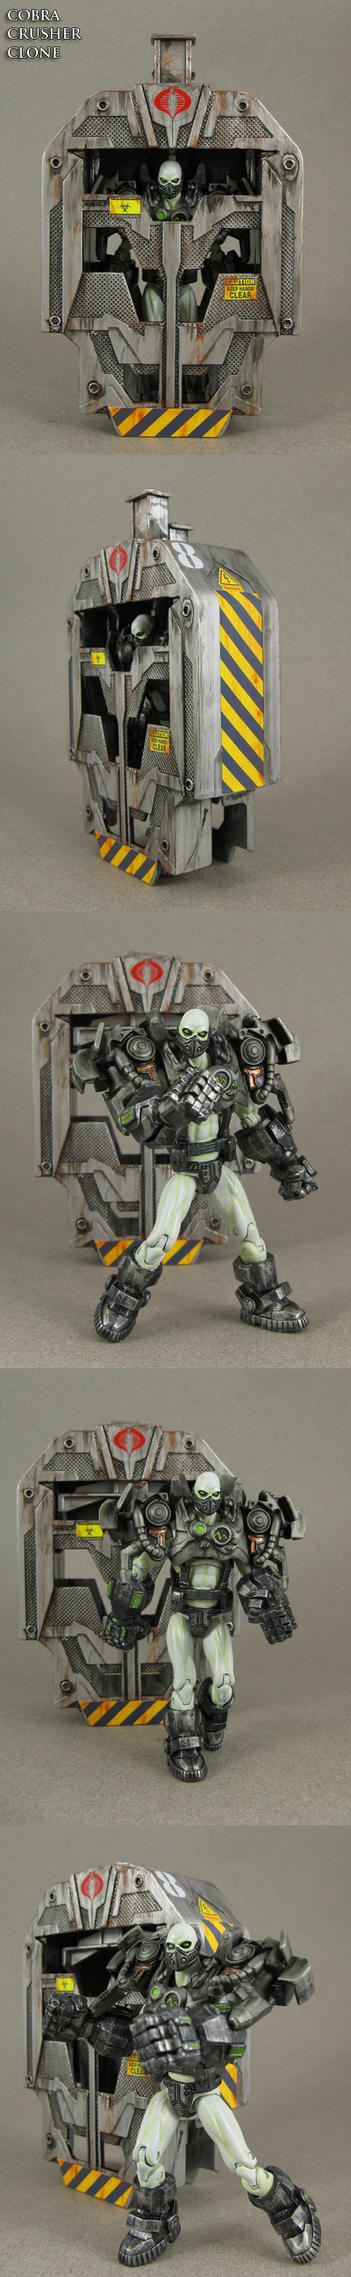 Custom Cobra Crusher Clone figure with drop pod by Jin-Saotome